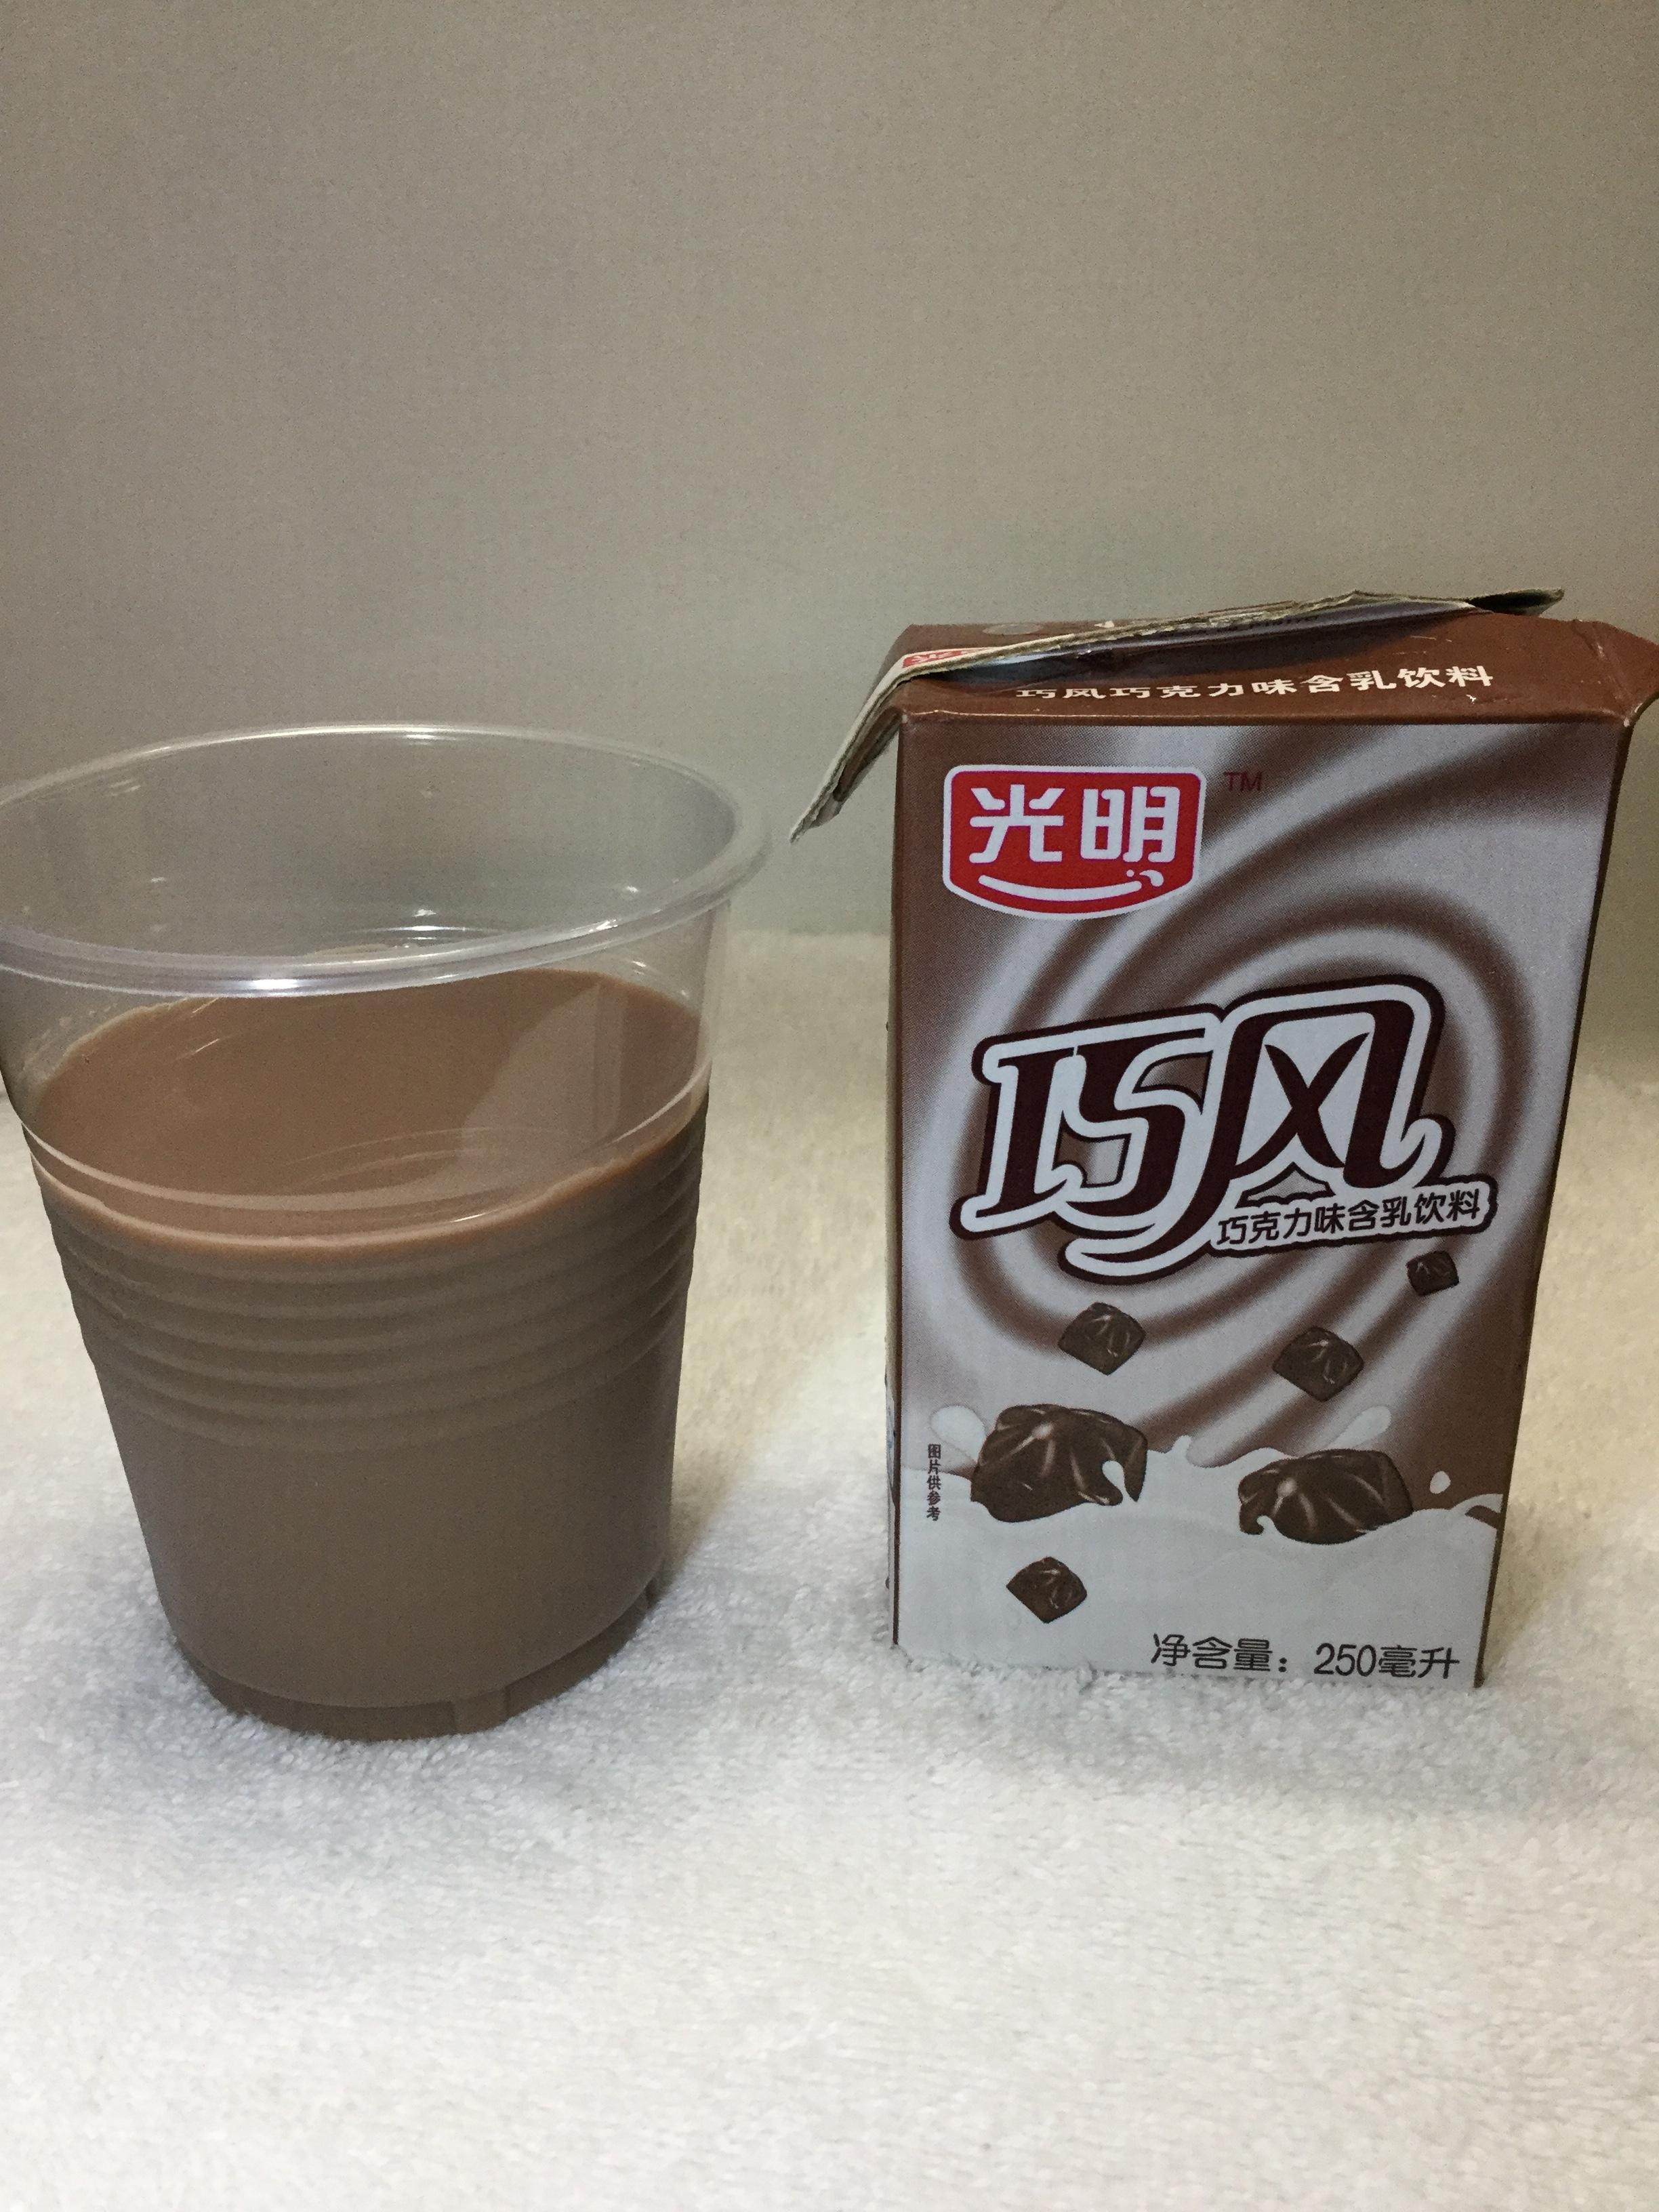 Bright Dairy Chocolate Milk (UHT) Cup